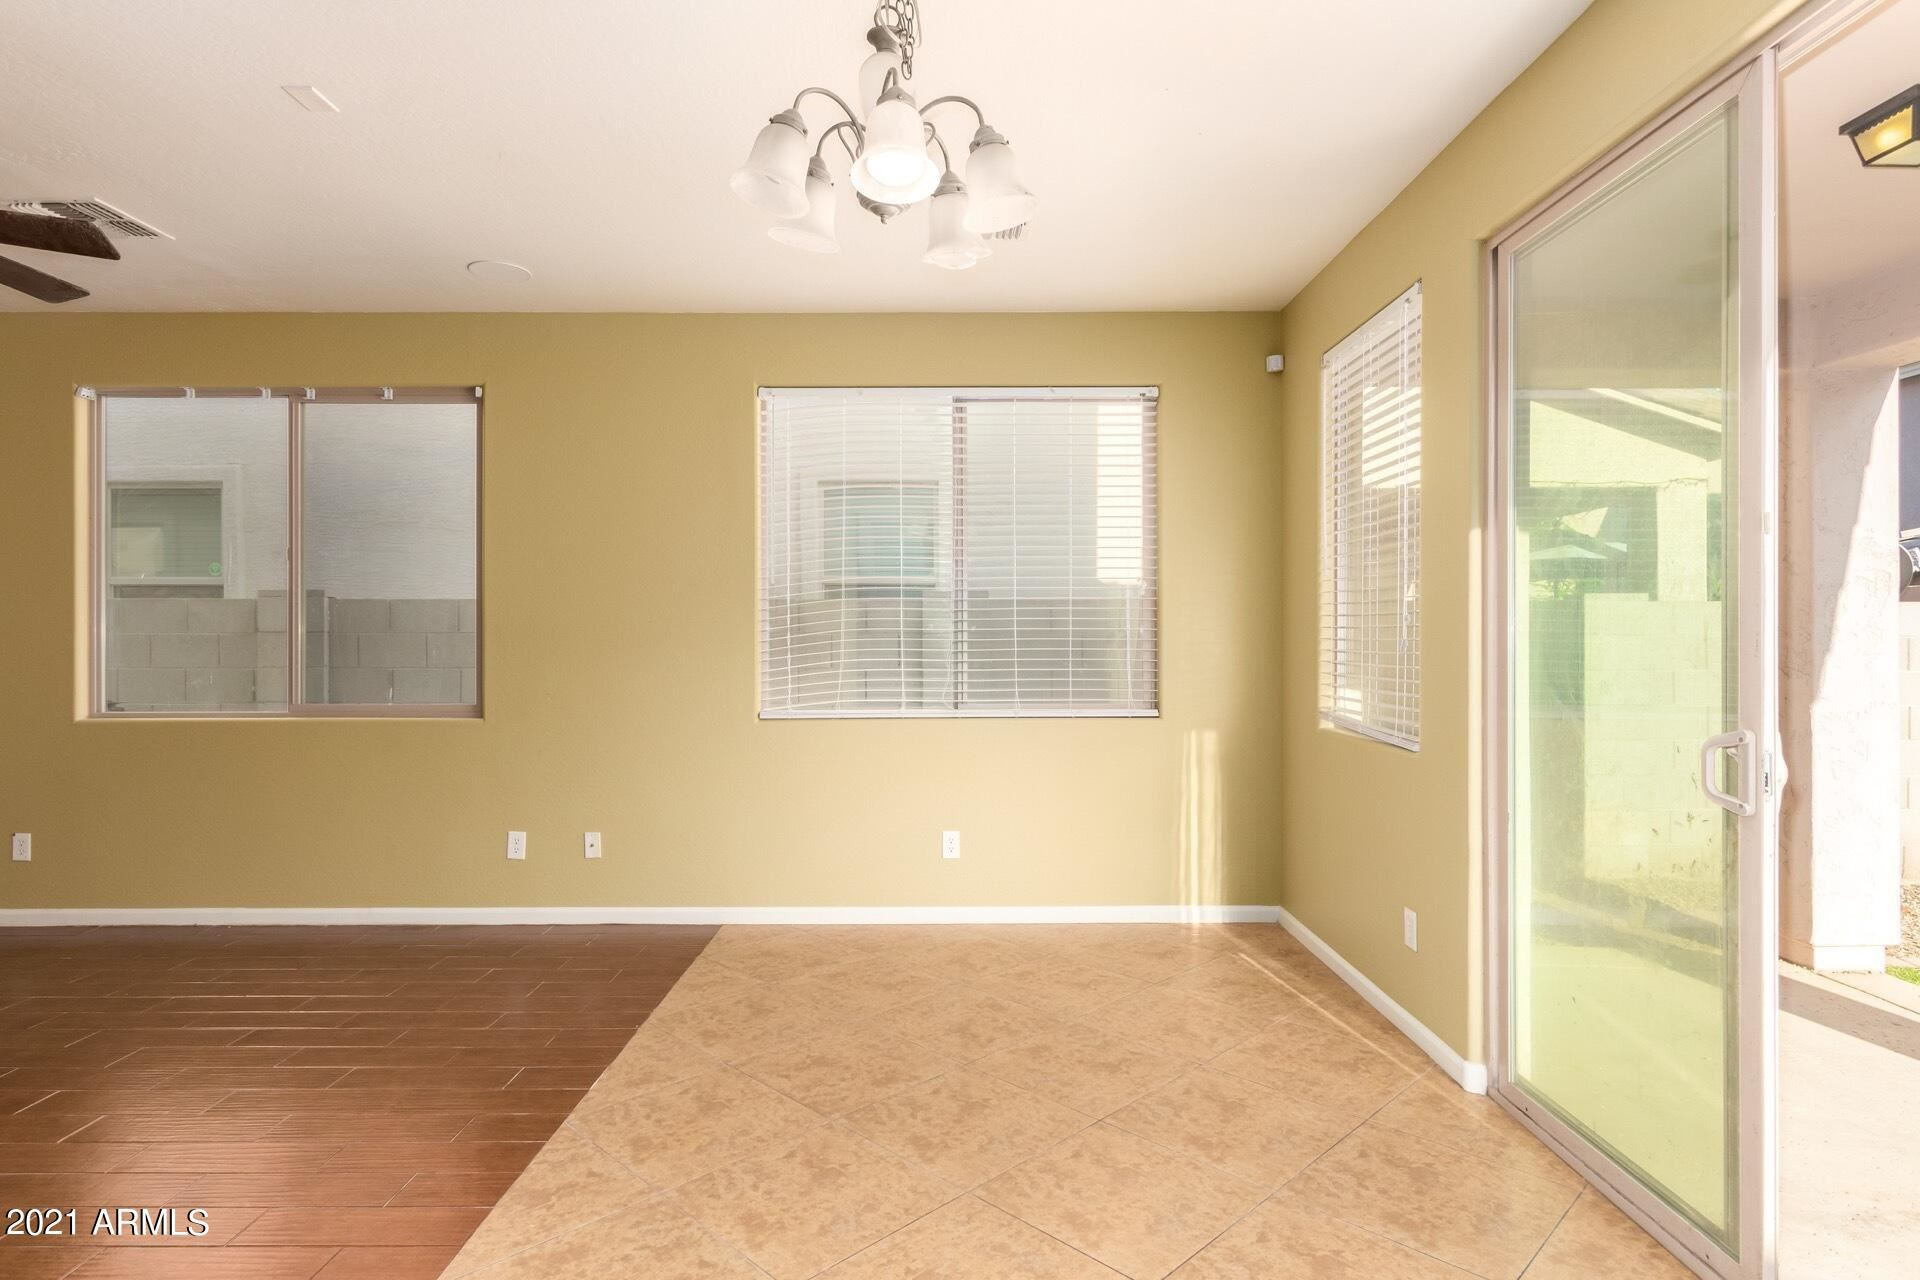 Photo of 11979 W FILLMORE Street, Avondale, AZ 85323 (MLS # 6293732)